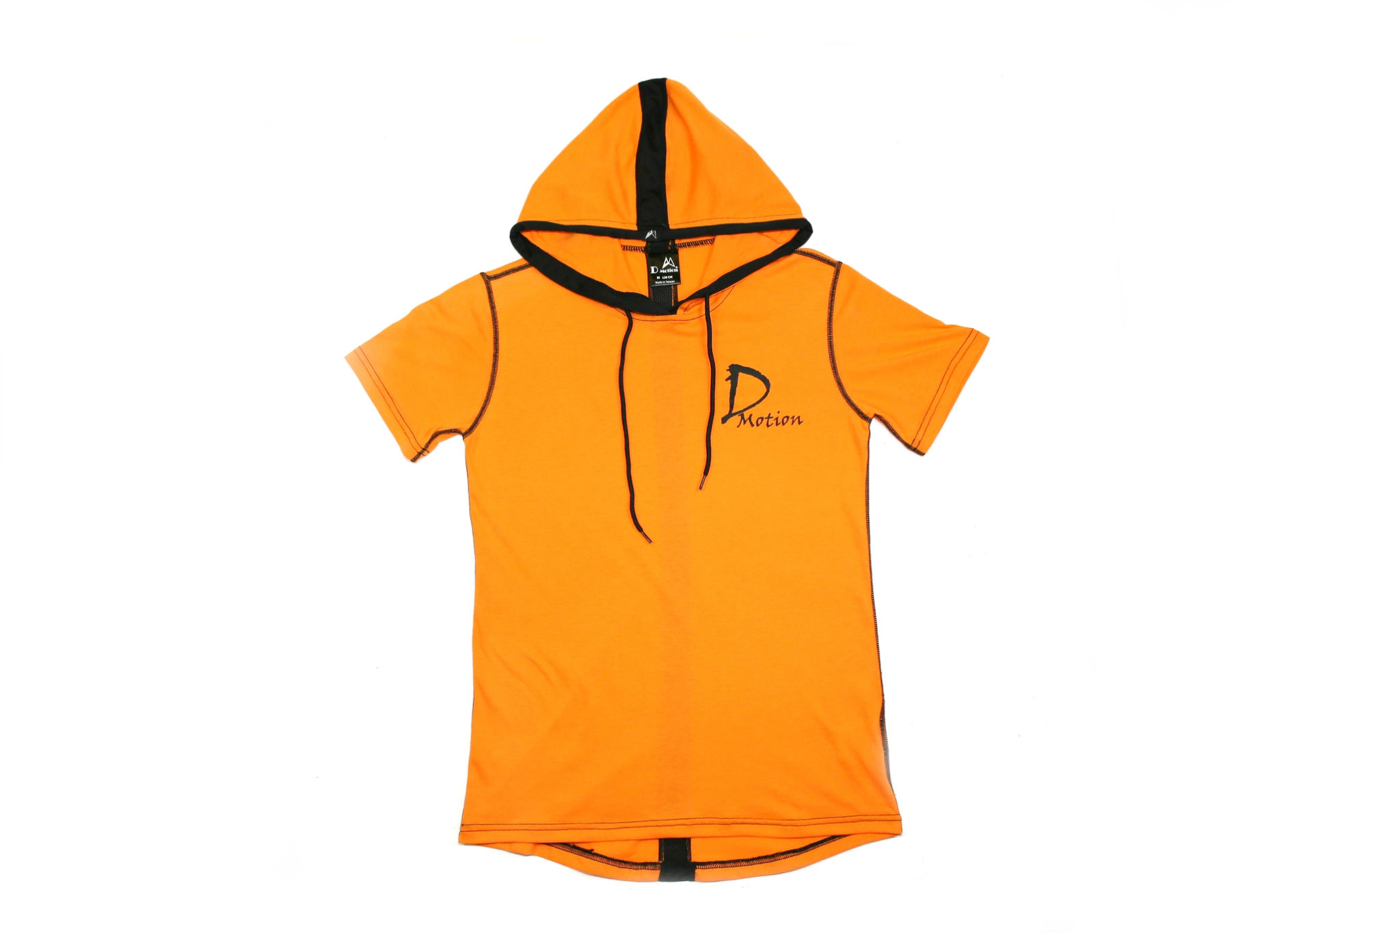 DMotion 男女前短後長連帽T恤 橘色 大童 台灣製